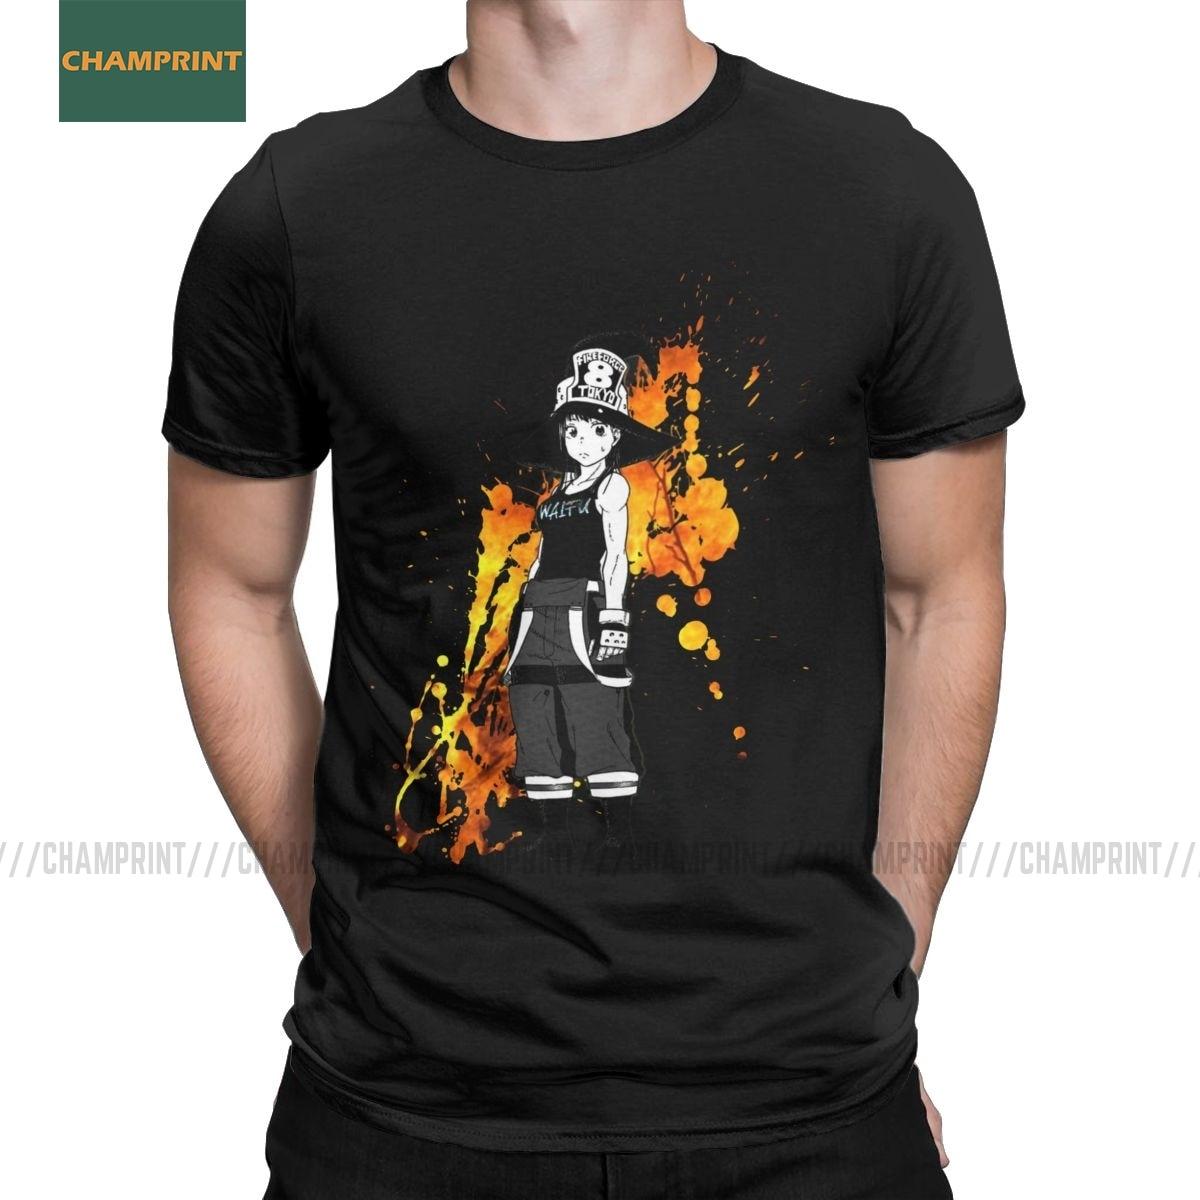 Men T-Shirt Maki Fire Force Cotton Tees Short Sleeve Shinra Anime Enen No Shouboutai Kusakabe Firefighter Japan Manga T Shirt